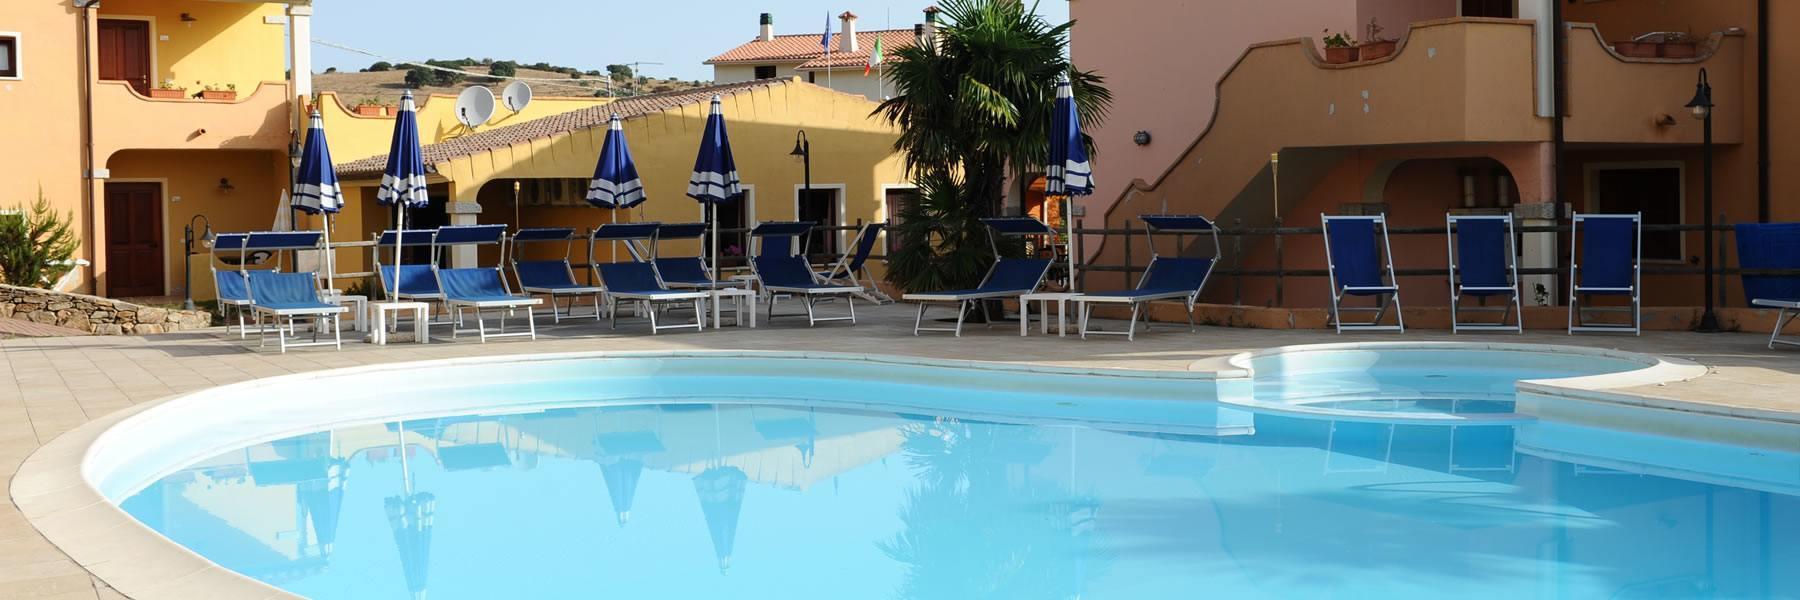 Residence con piscina a budoni sardegna residence corte for Residence con piscina budoni